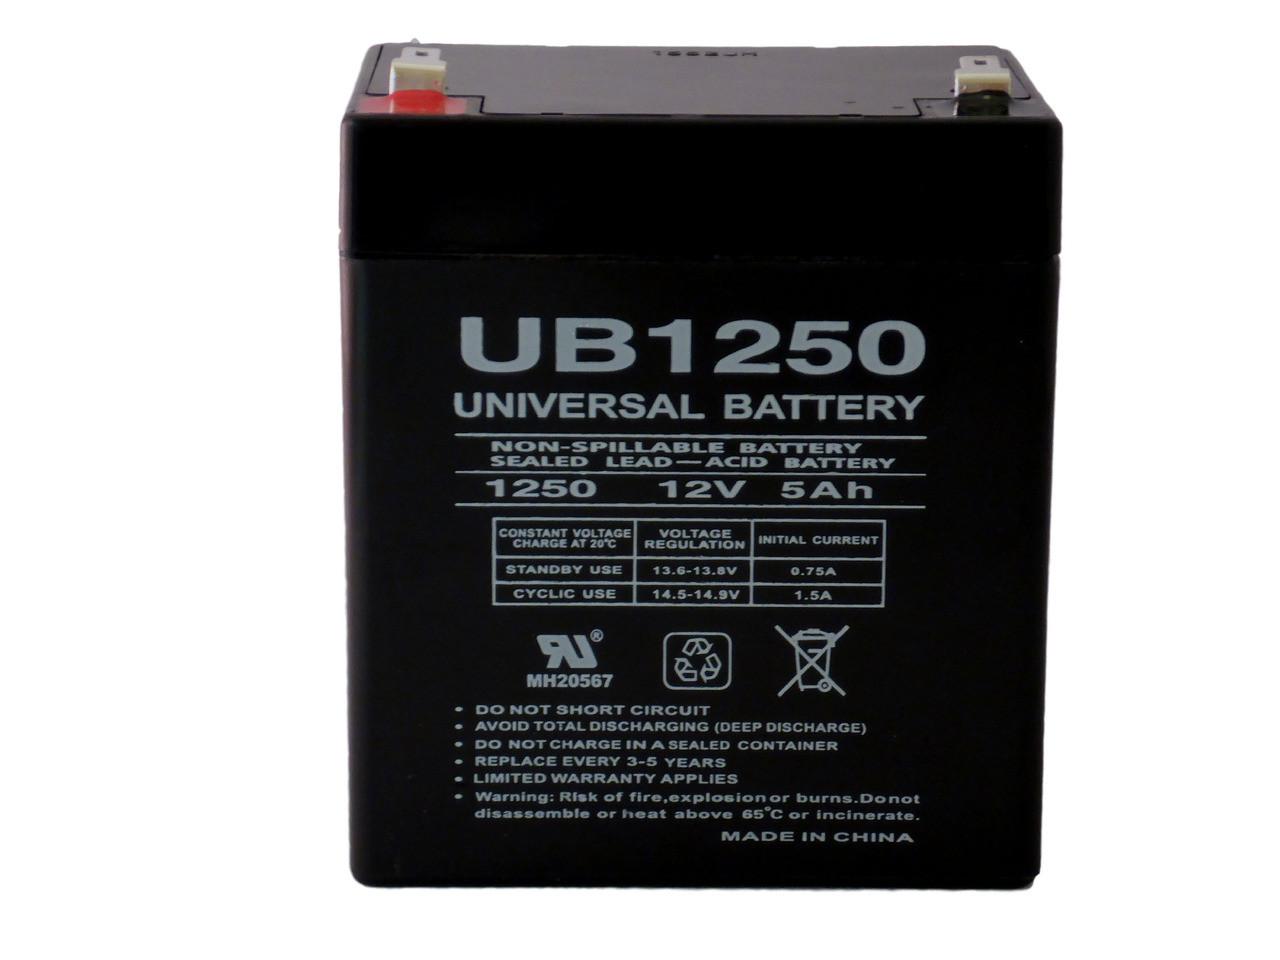 12V, 5Ah, 5000mAh, F2 Terminal, AGM, SLA Replacement UB1250 Universal Sealed Lead Acid Battery Napco Alarms MA1016E Battery